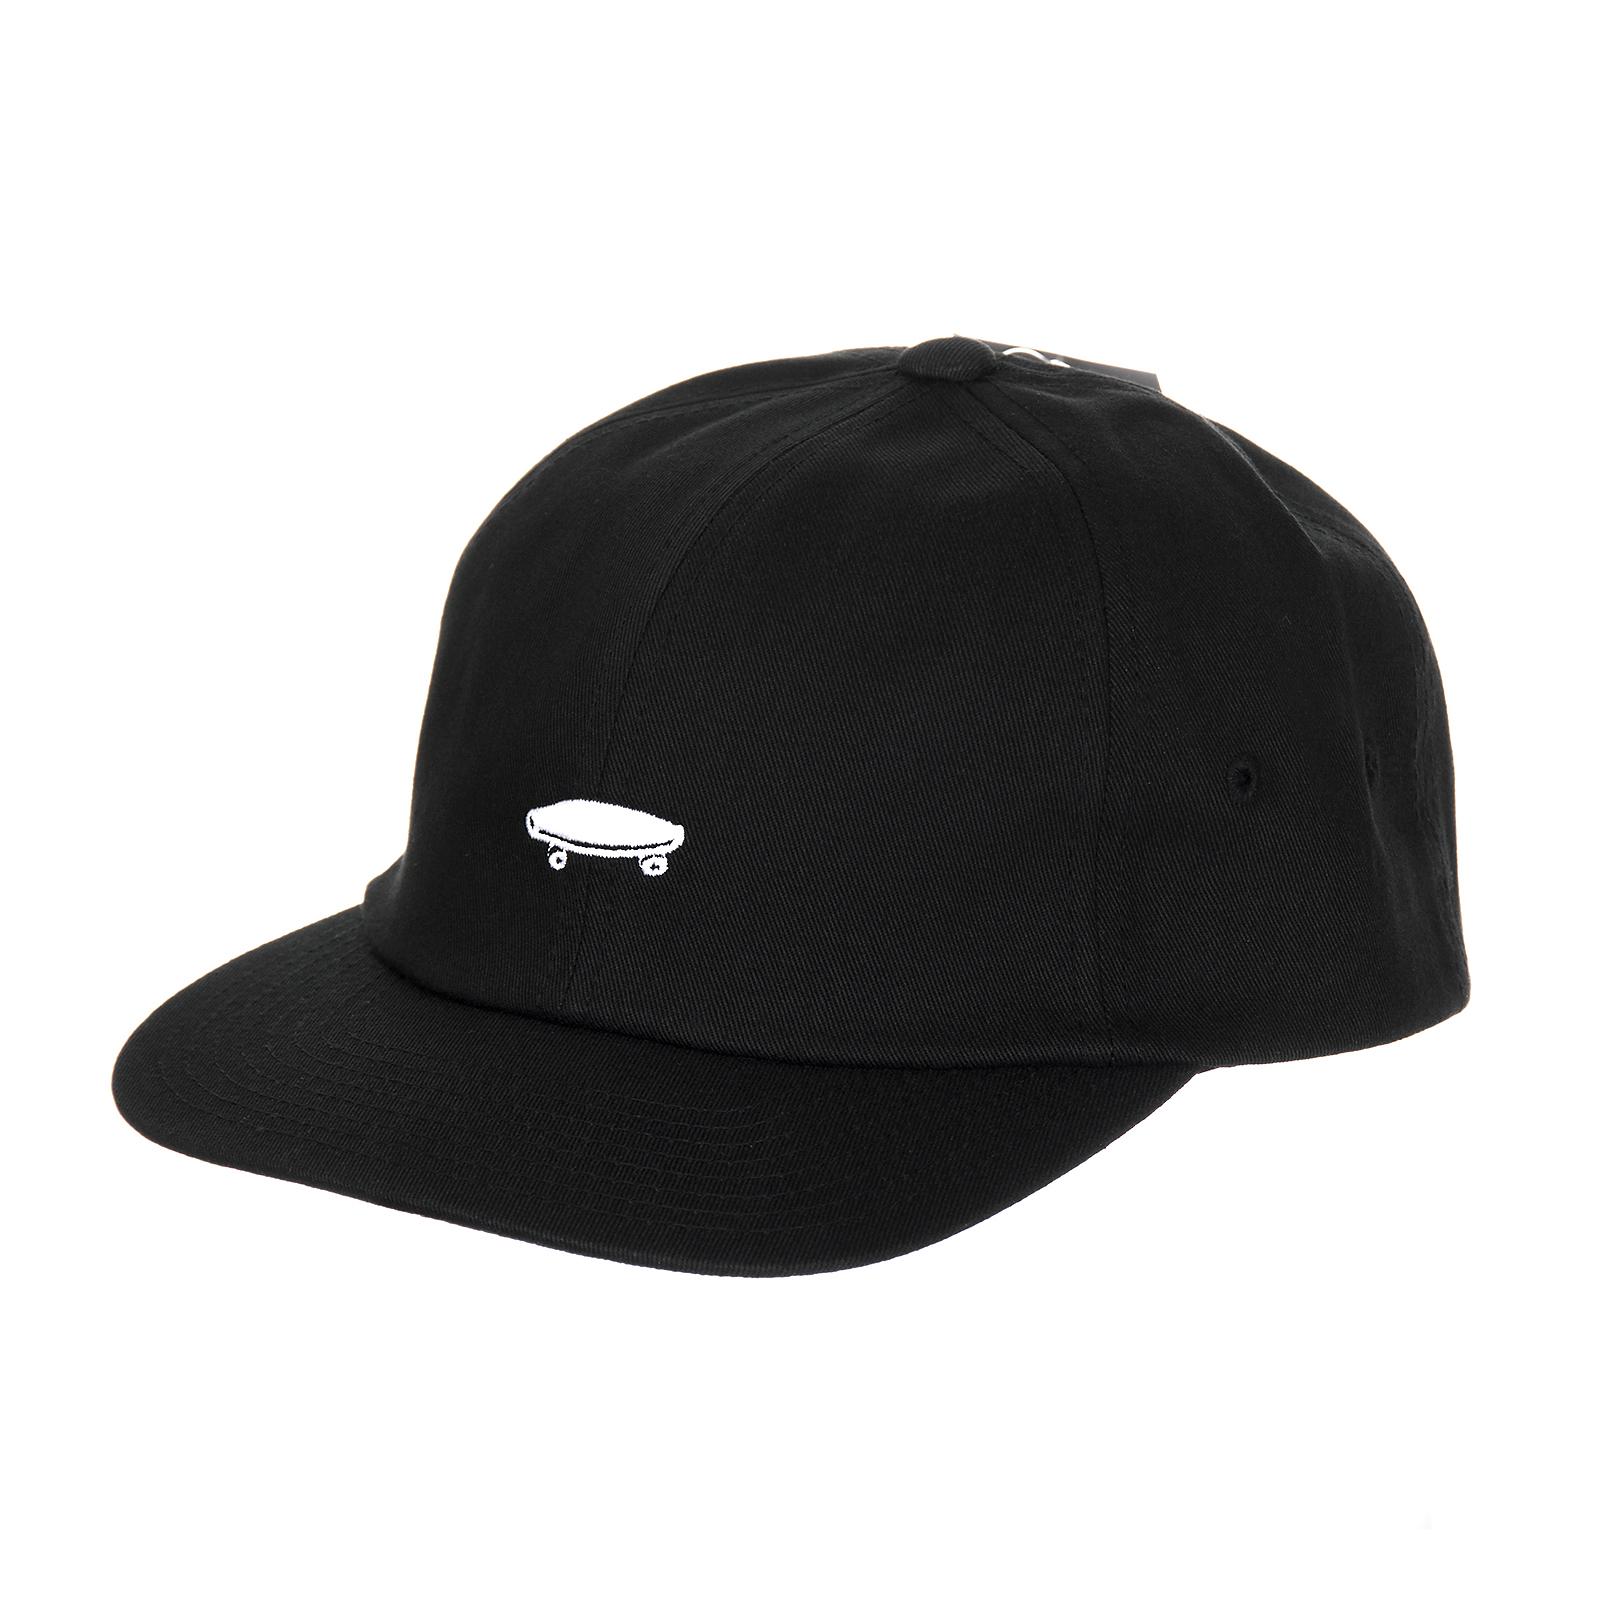 Dettagli su Vans cappello Mn Thrasher X Vans J Black (Thrasher) hat